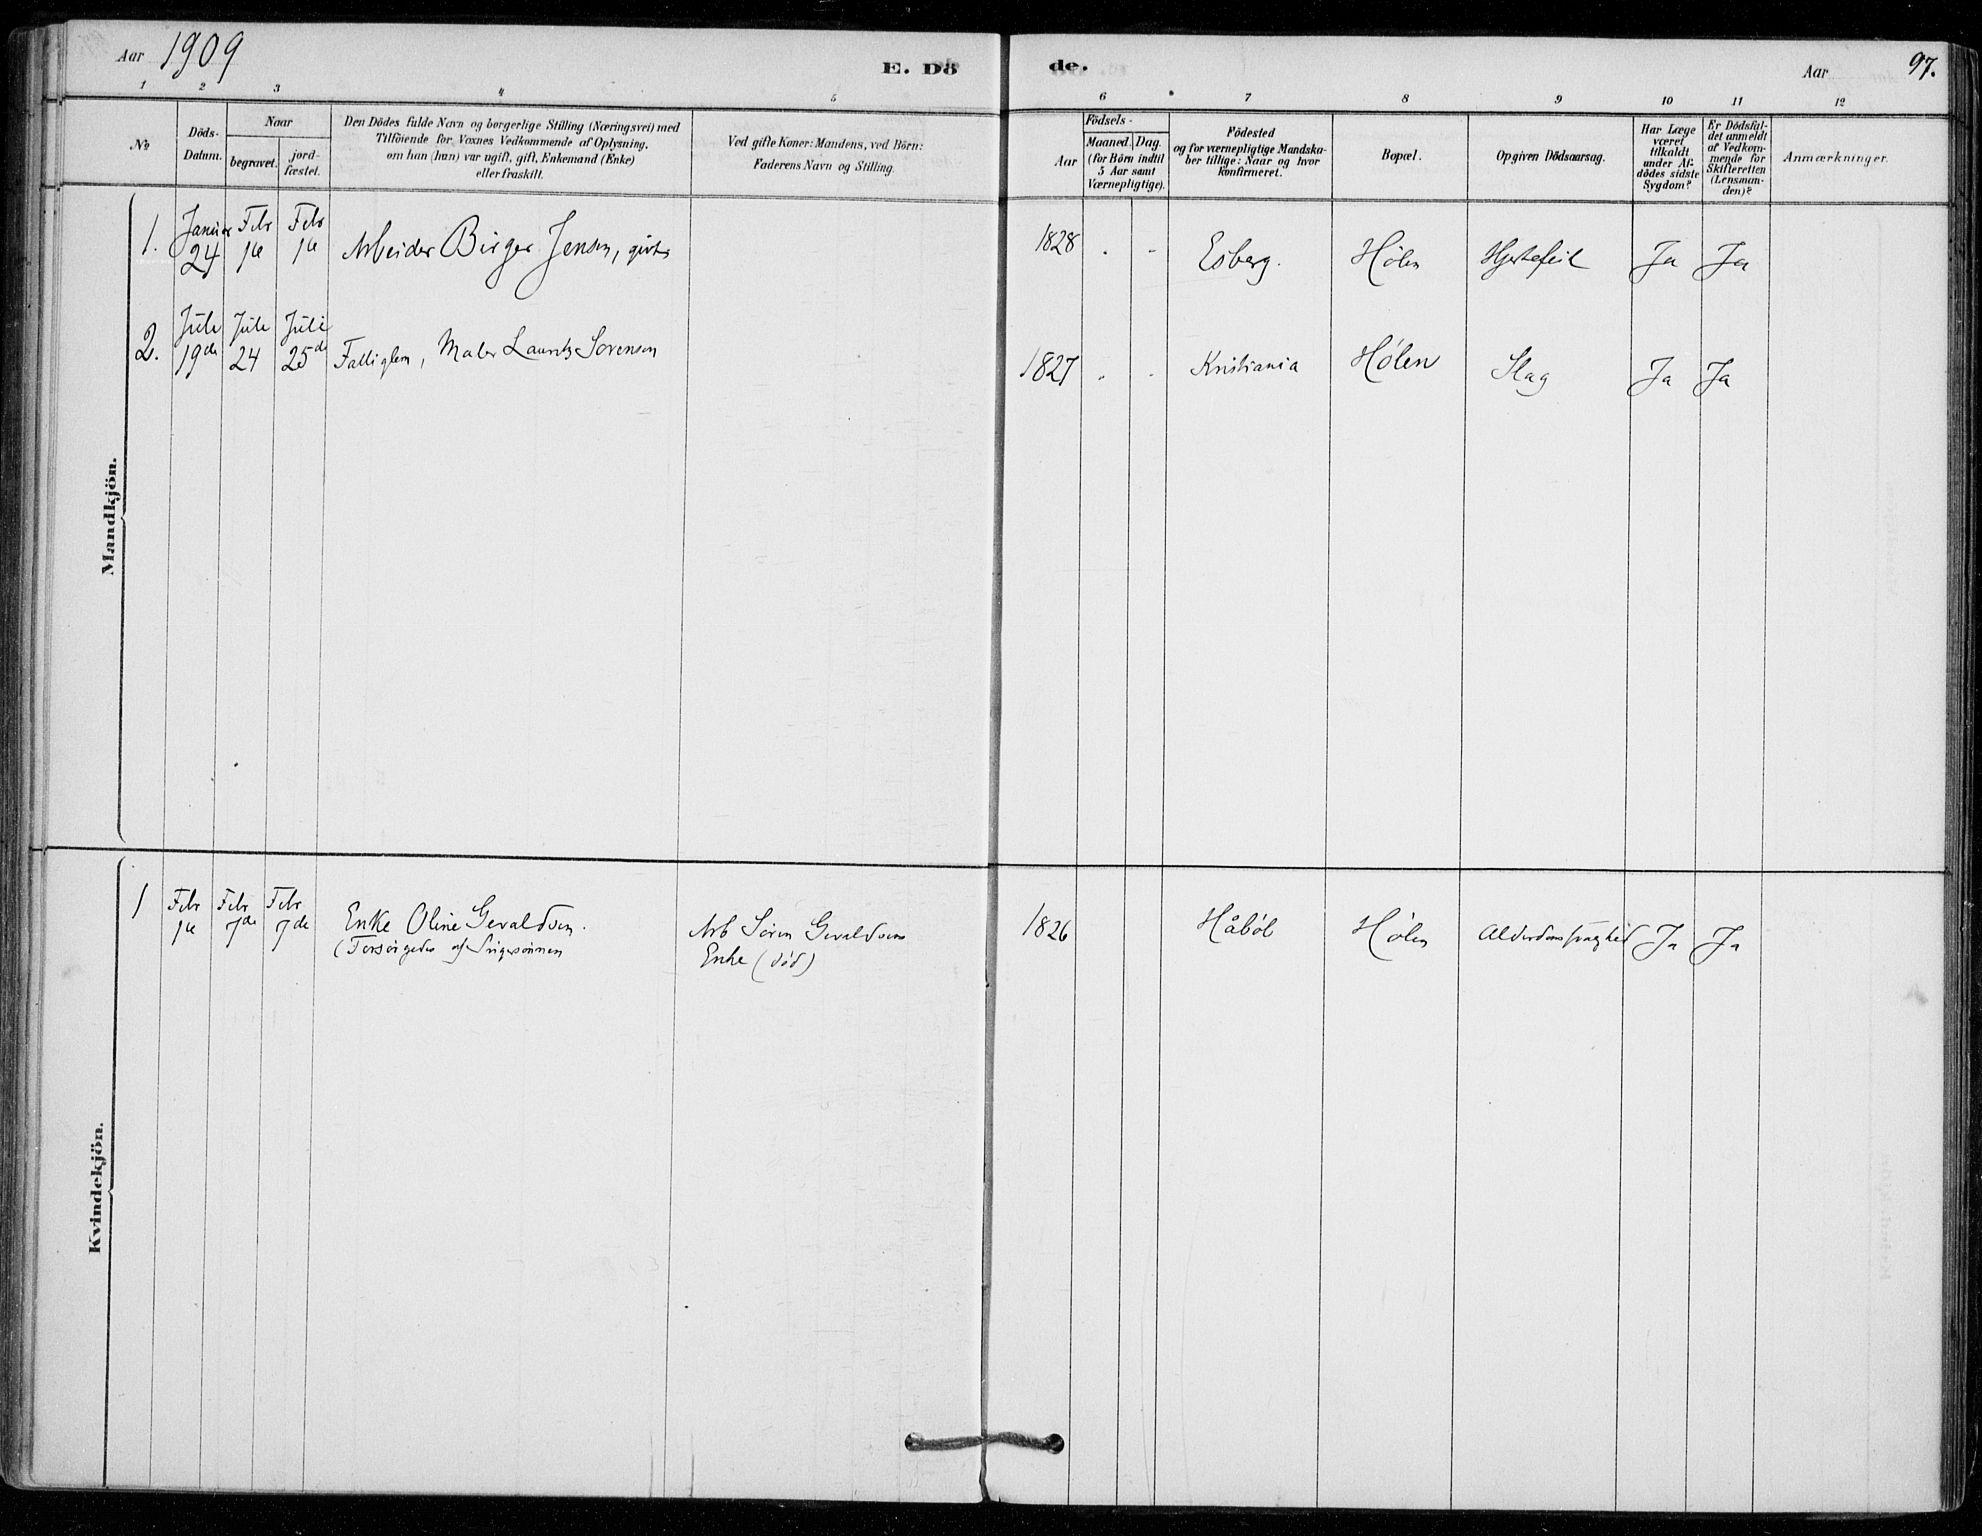 SAO, Vestby prestekontor Kirkebøker, F/Fe/L0001: Ministerialbok nr. V 1, 1878-1931, s. 97